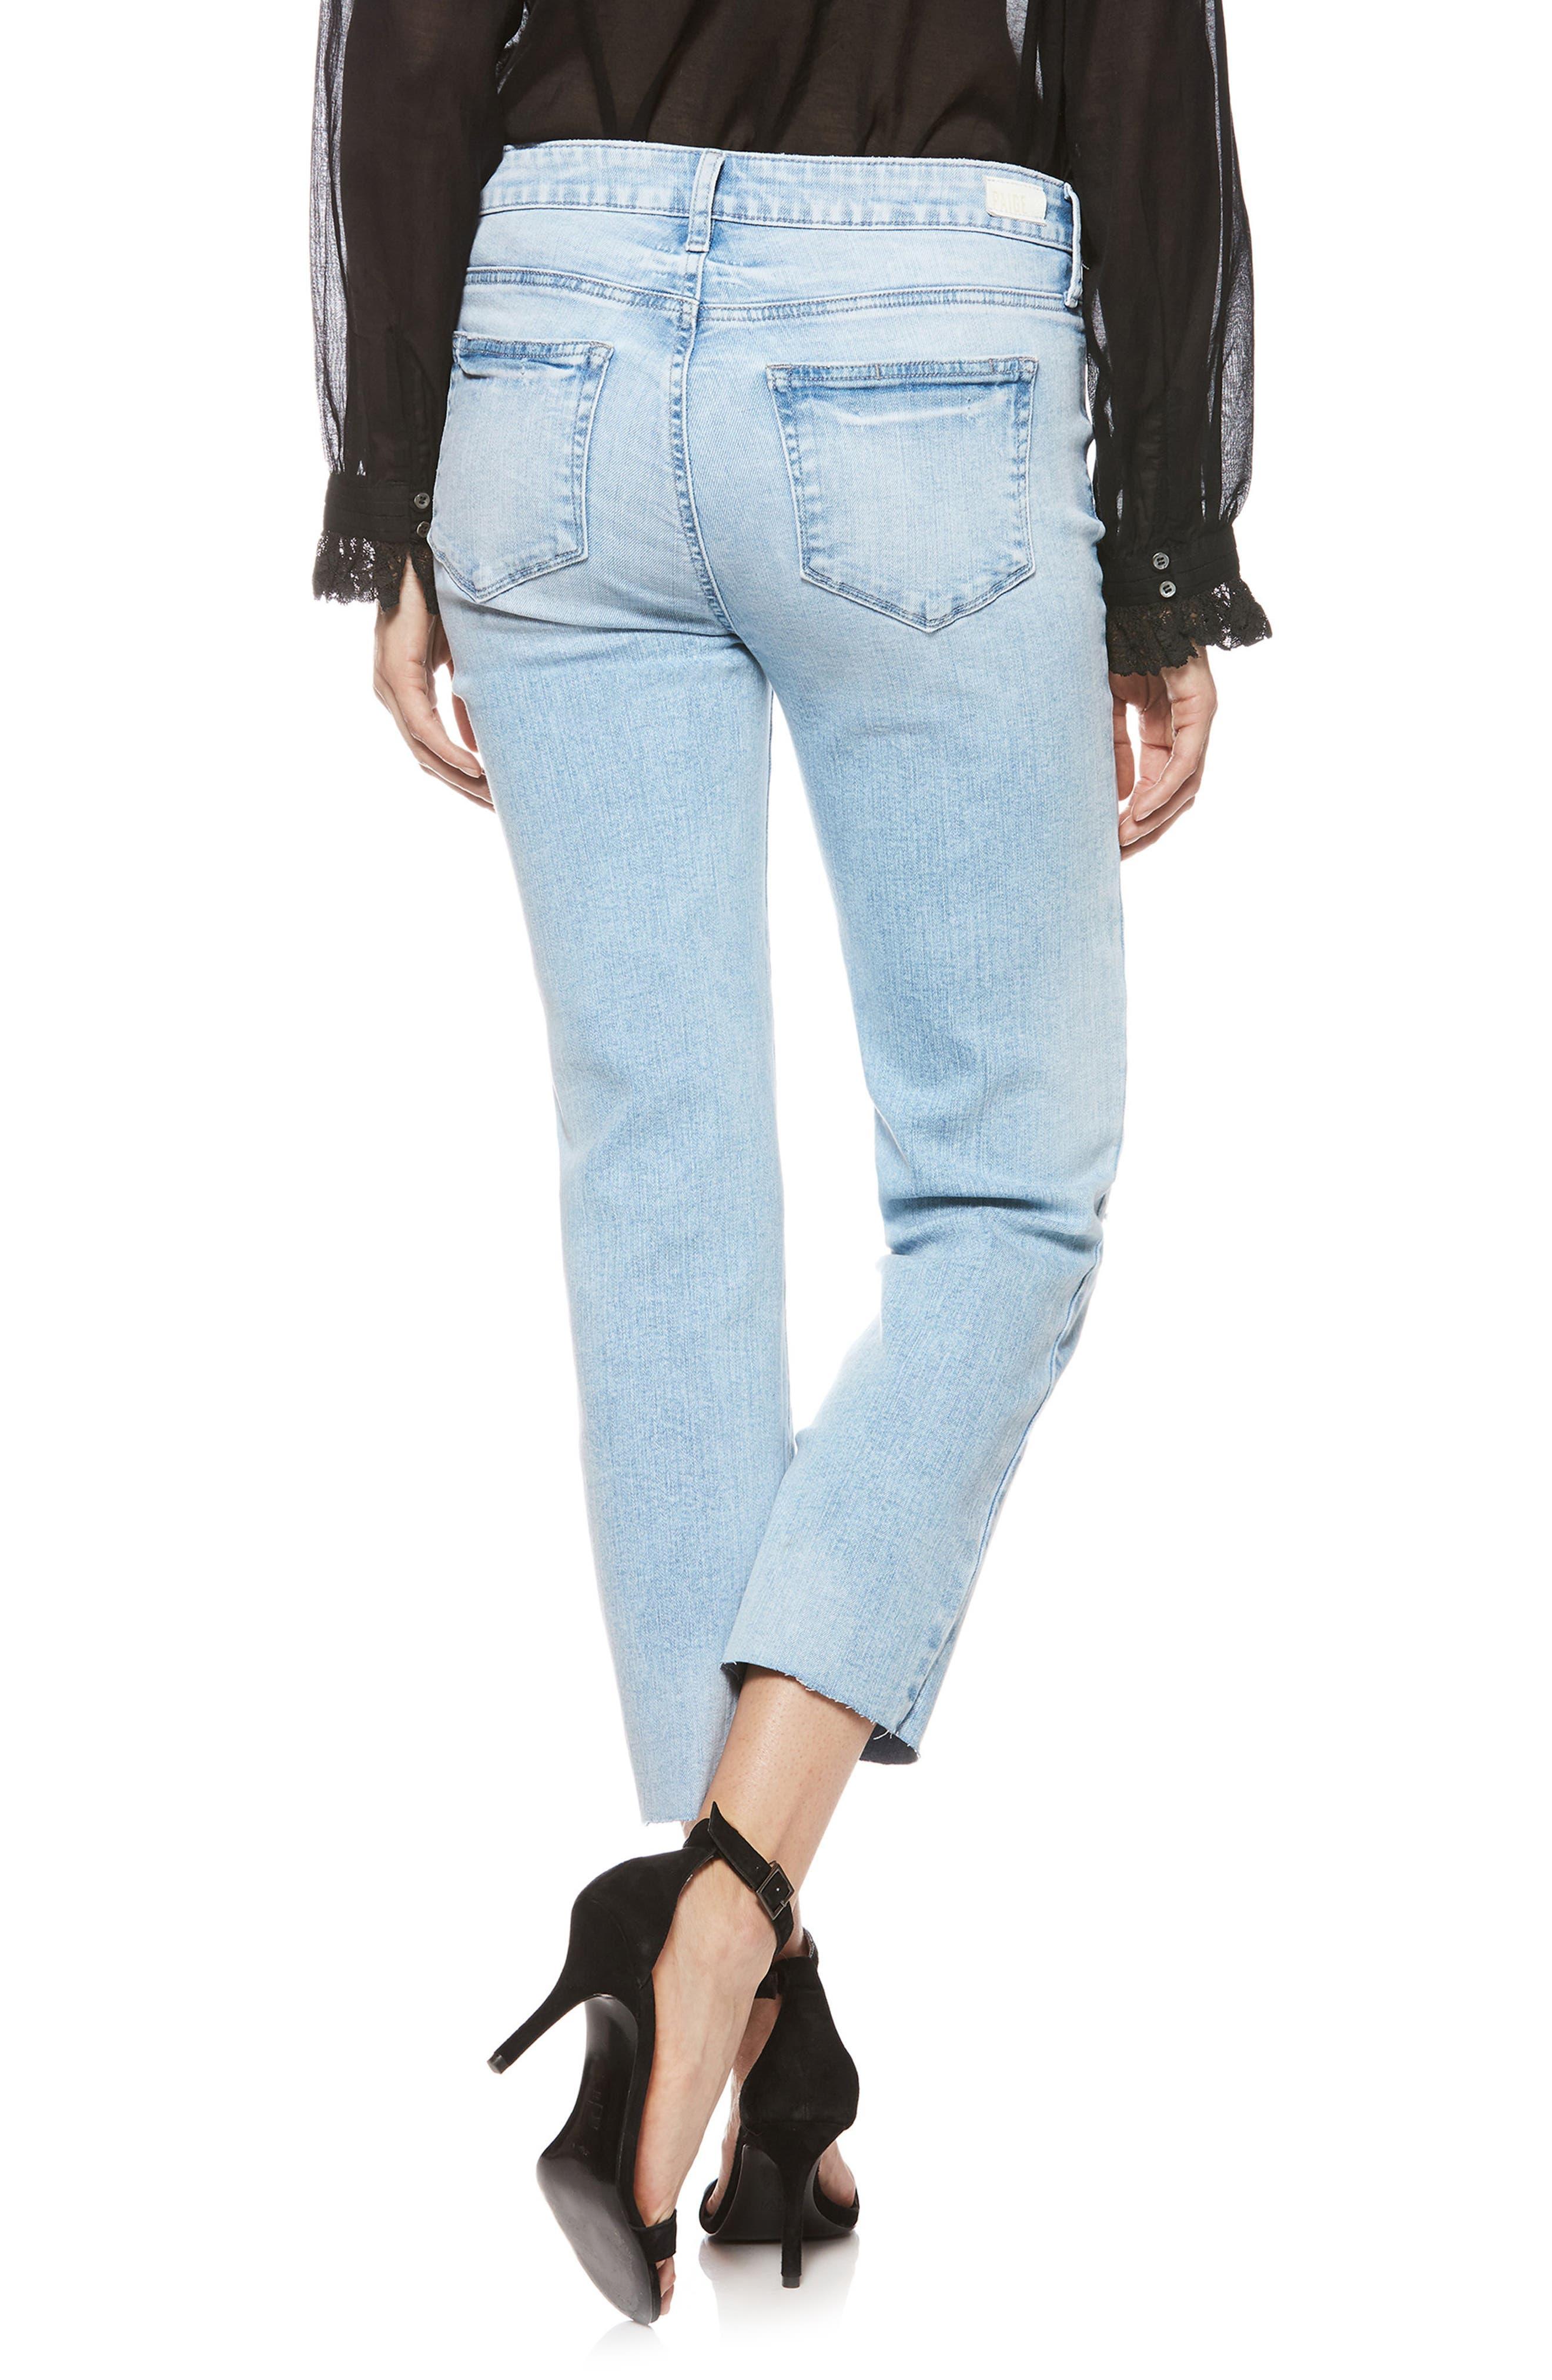 Hoxton High Waist Crop Straight Leg Jeans,                             Alternate thumbnail 2, color,                             Pasadena W/ Wash Crease